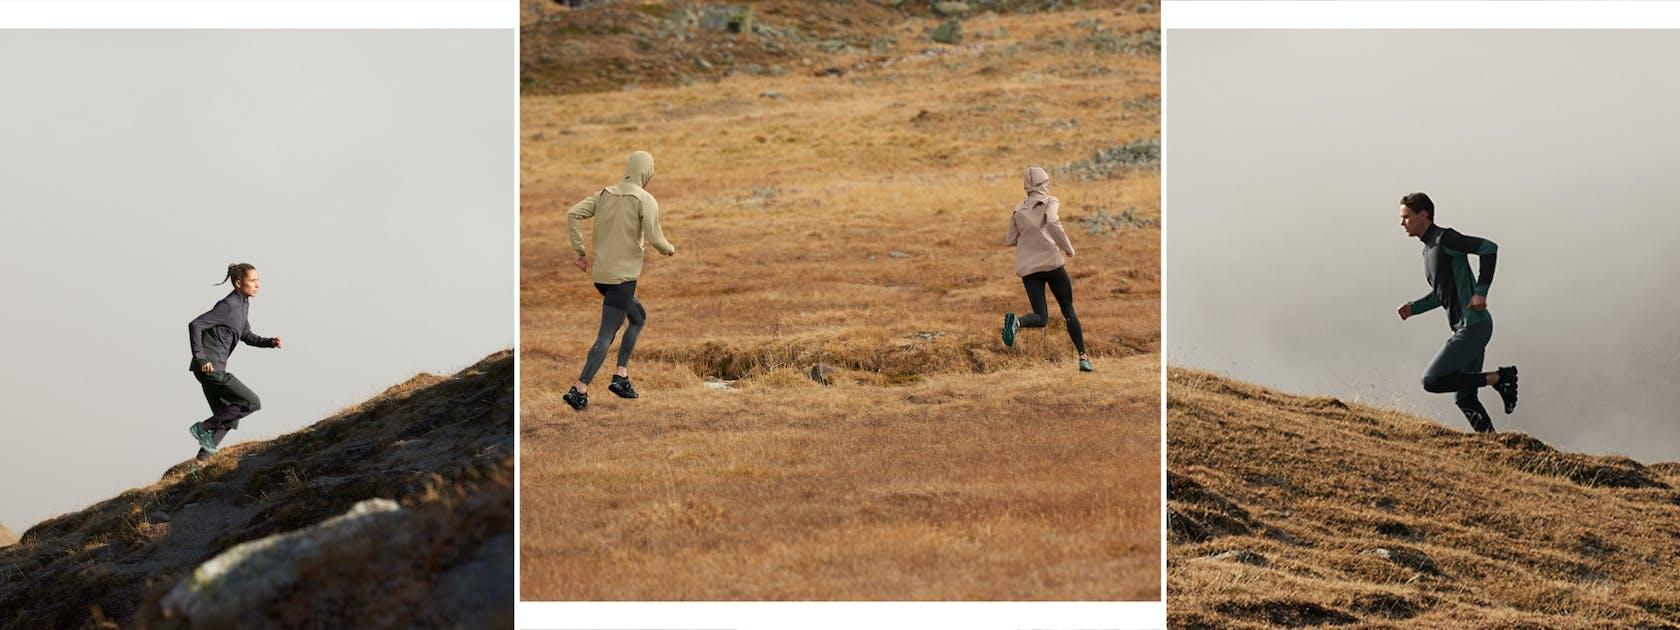 ON Trailrunning